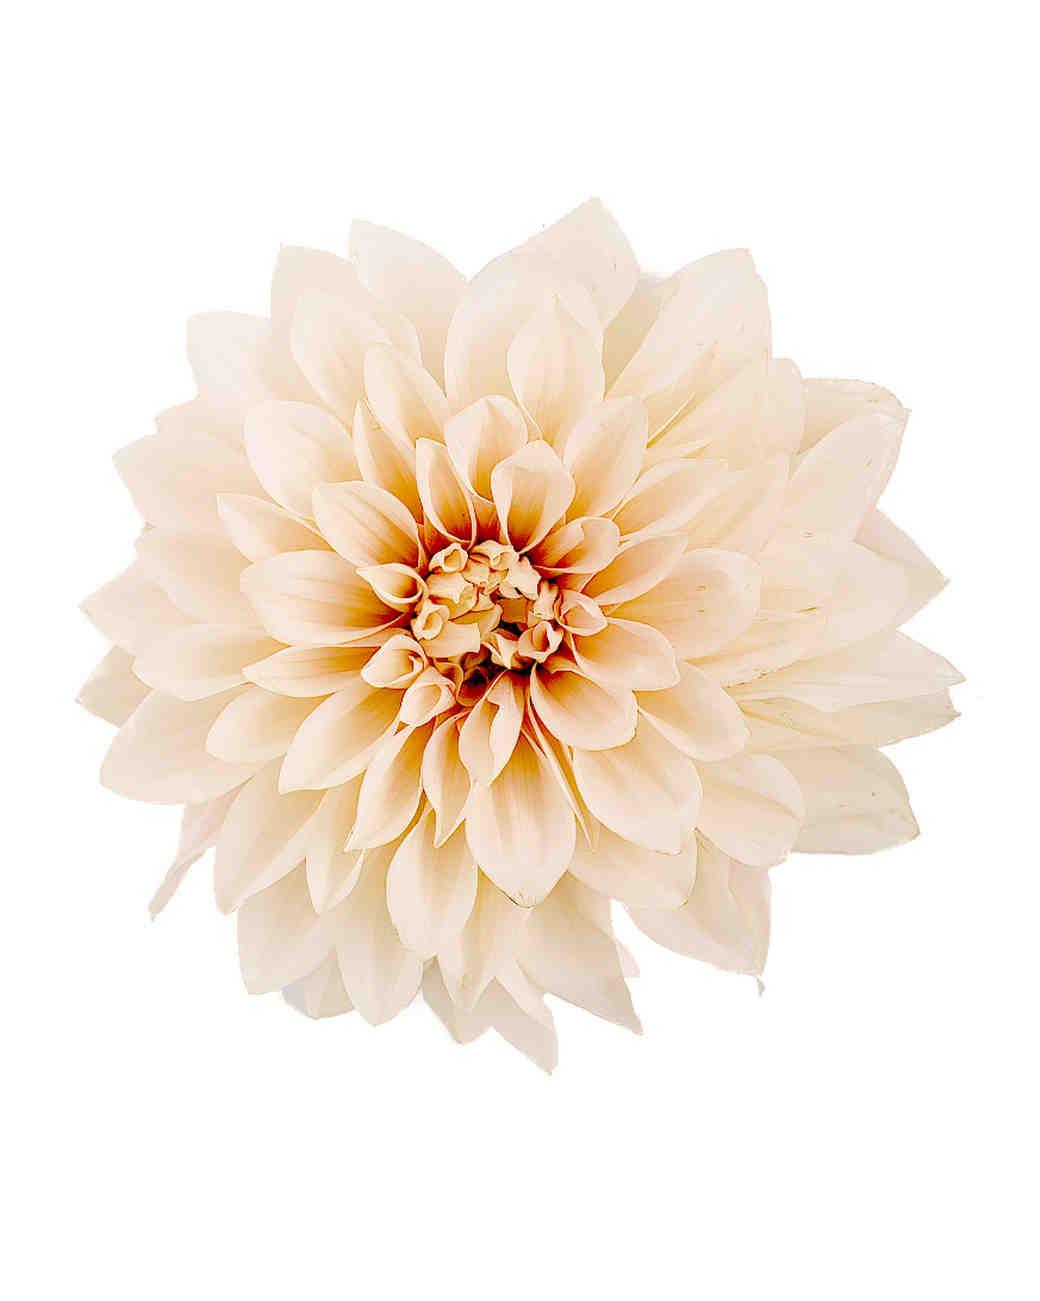 Flower Meanings Diy Interior Floral Design